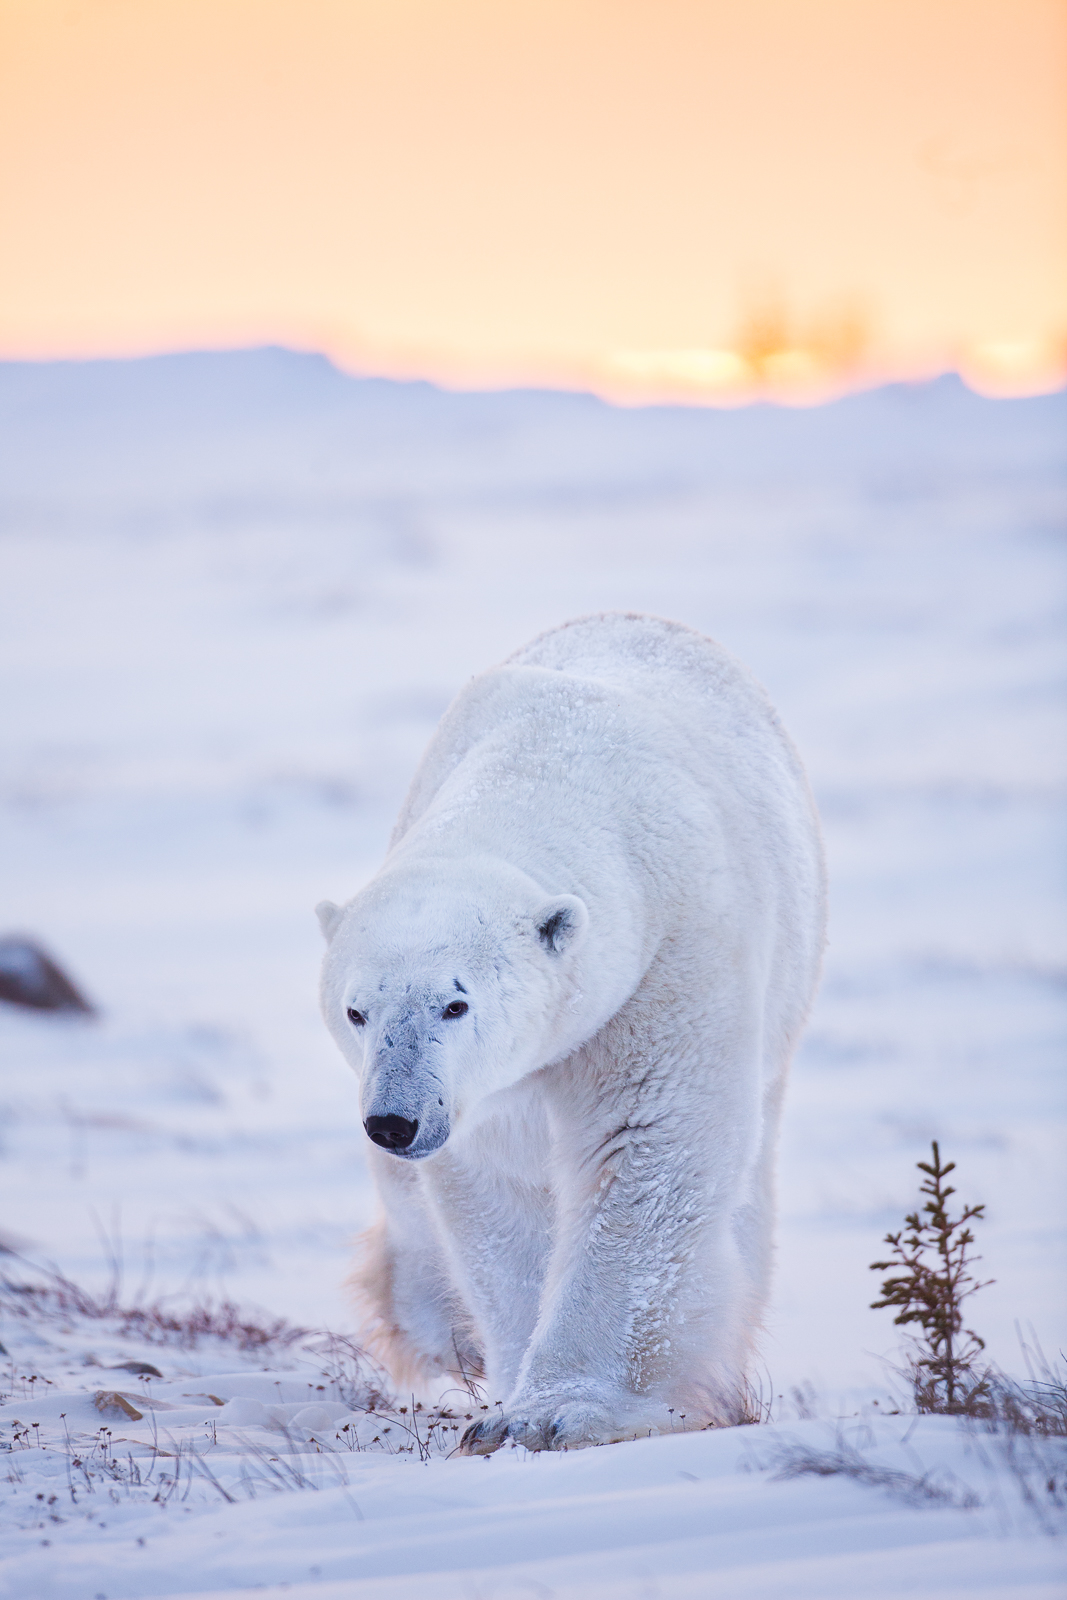 Warrior,Fall,Polar bear,Sunset,Wildlife,Winter, photo